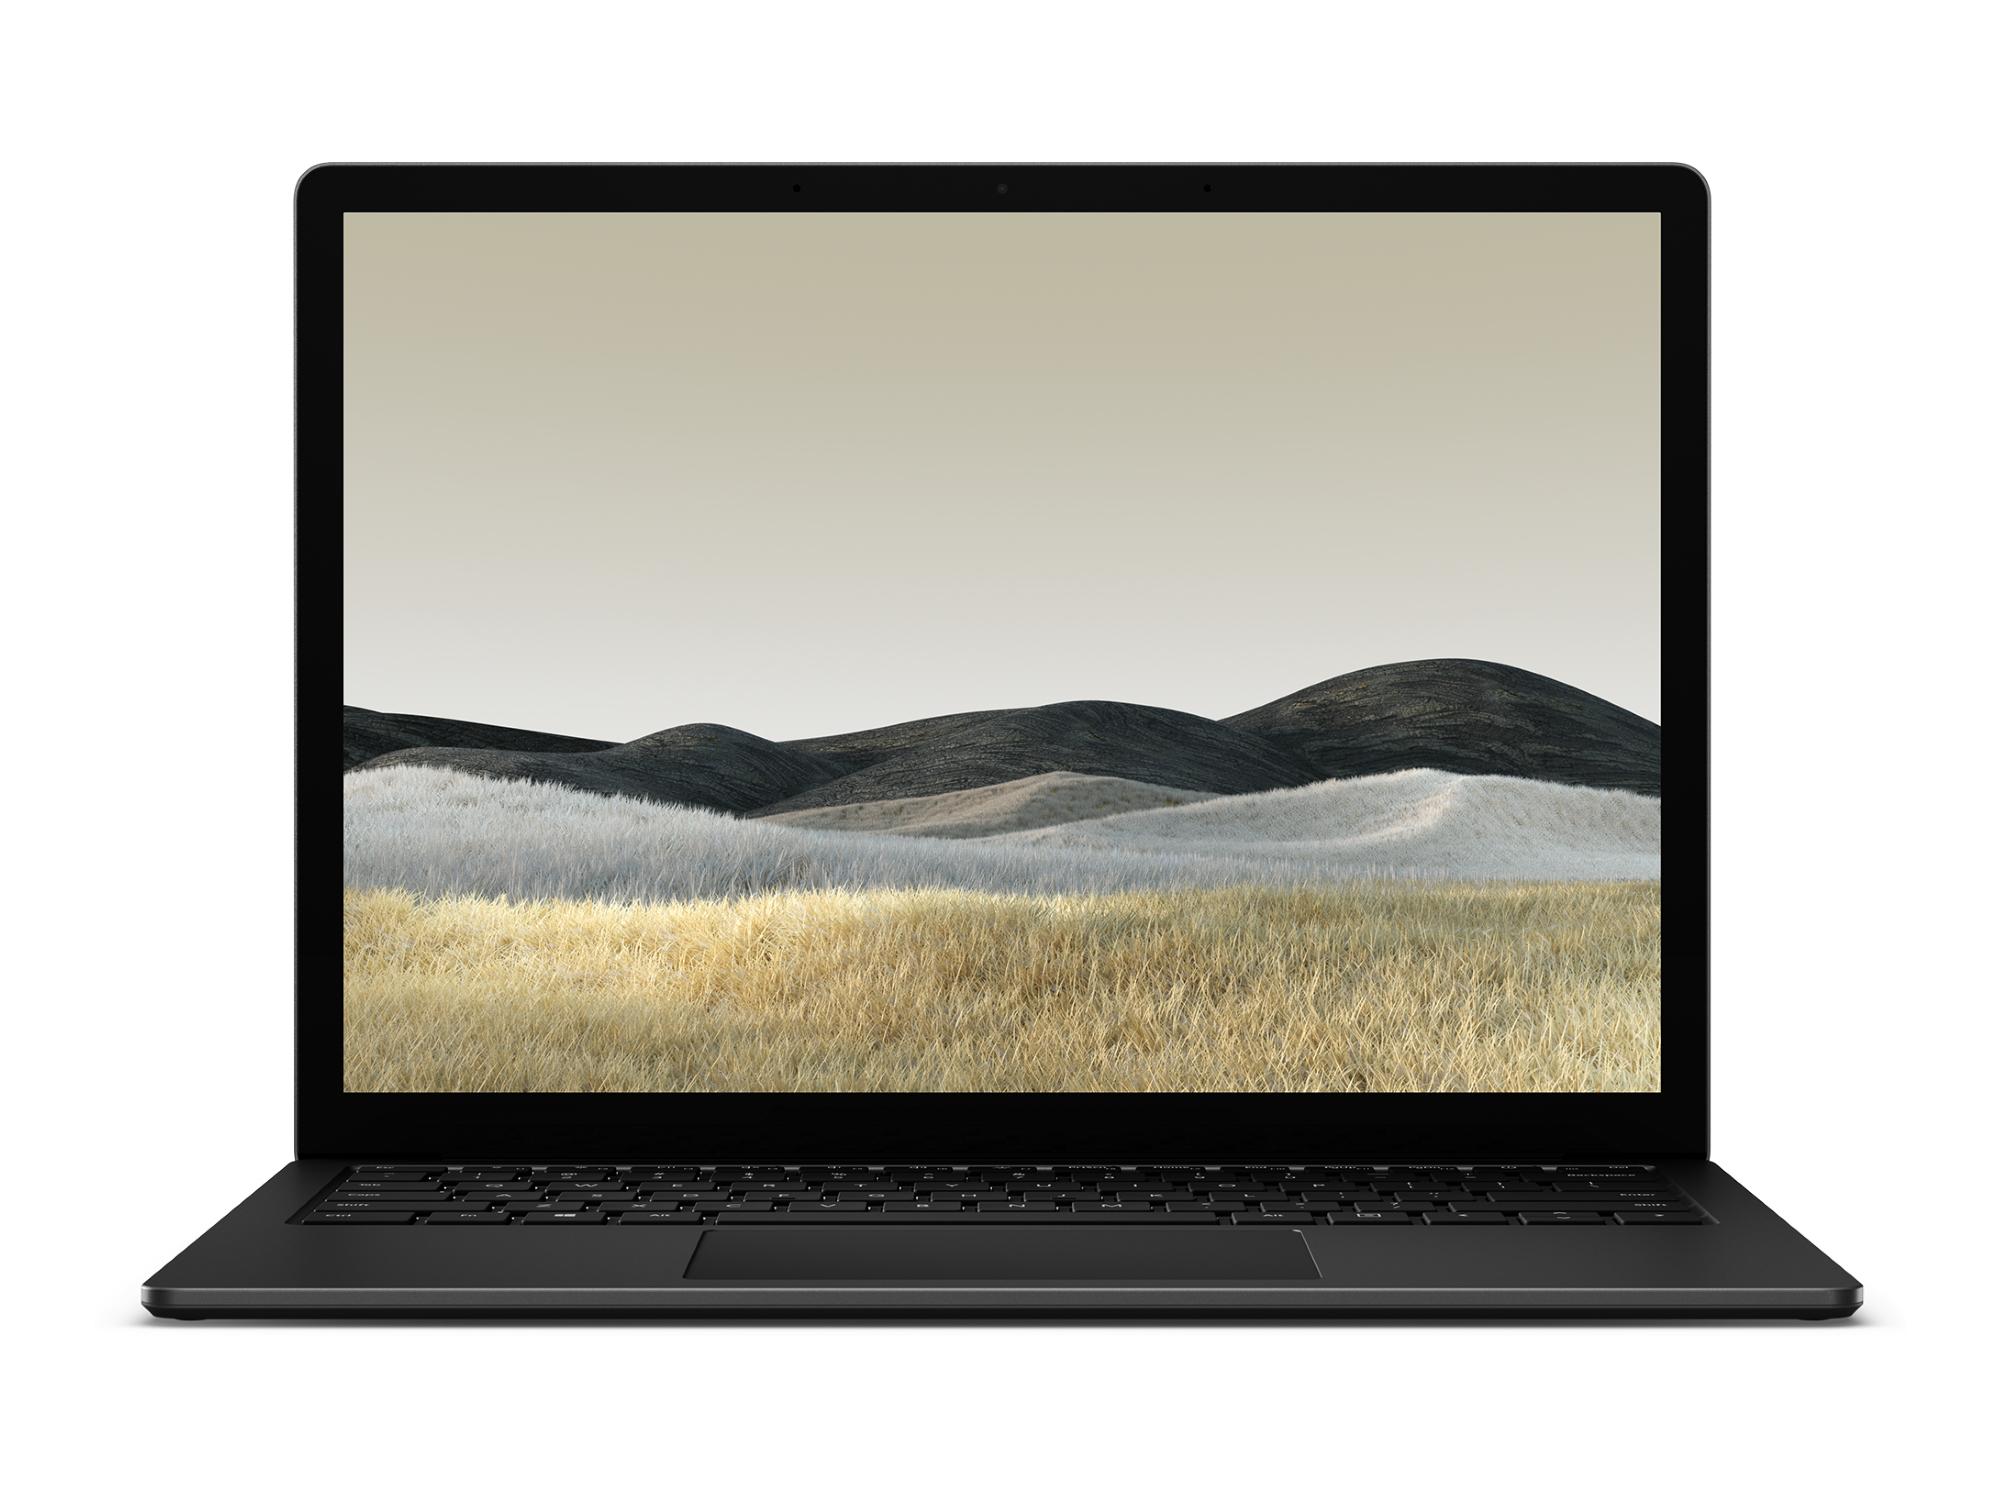 "Microsoft Surface Laptop 3 Portátil Negro 34,3 cm (13.5"") 2256 x 1504 Pixeles Pantalla táctil Intel® Core™ i7 de 10ma Generación 16 GB LPDDR4x-SDRAM 512 GB SSD Wi-Fi 6 (802.11ax) Windows 10 Pro"